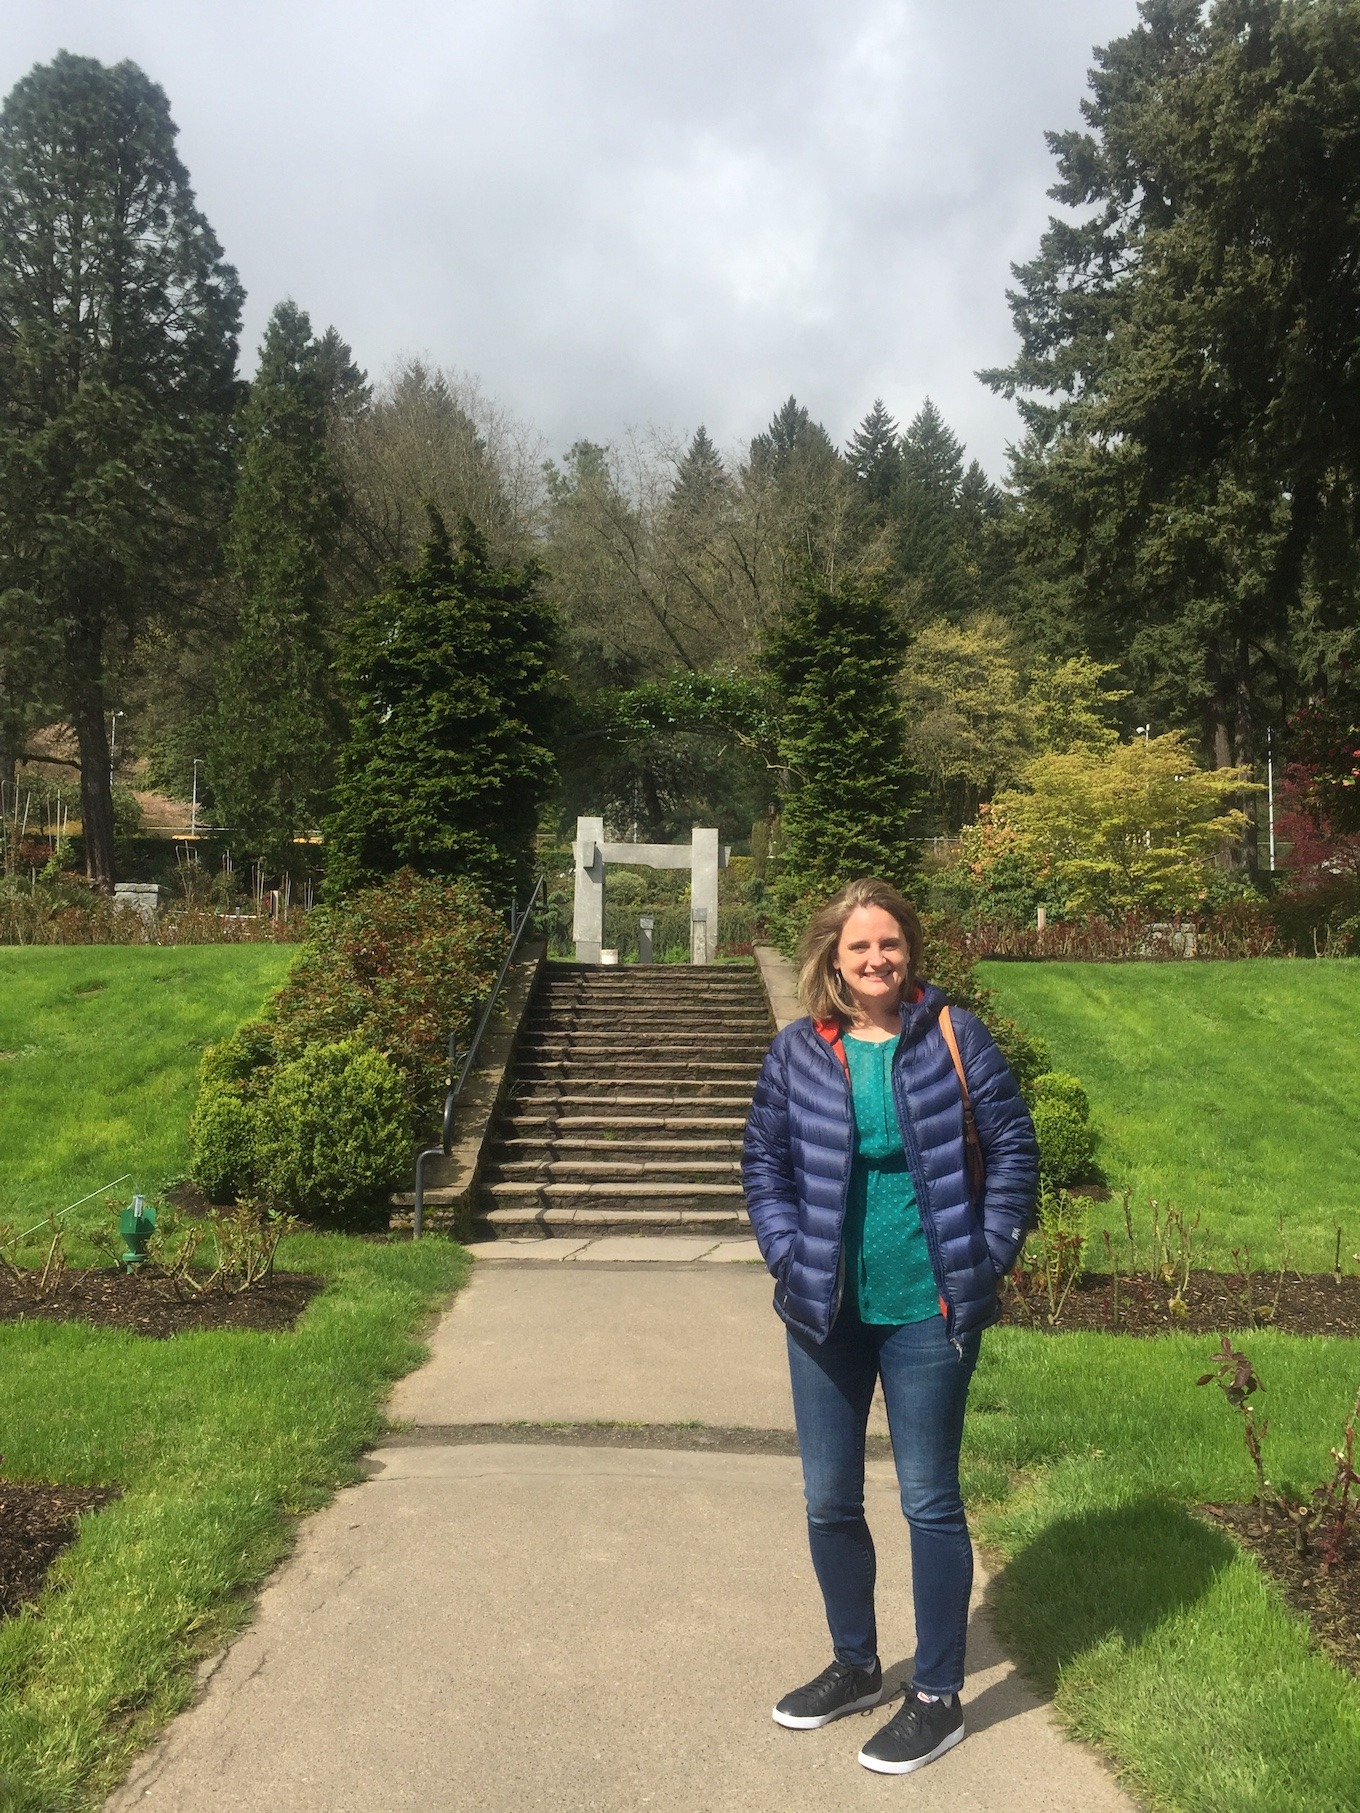 Rose Garden, Portland Oregon www.thethreeyearexperiment.com